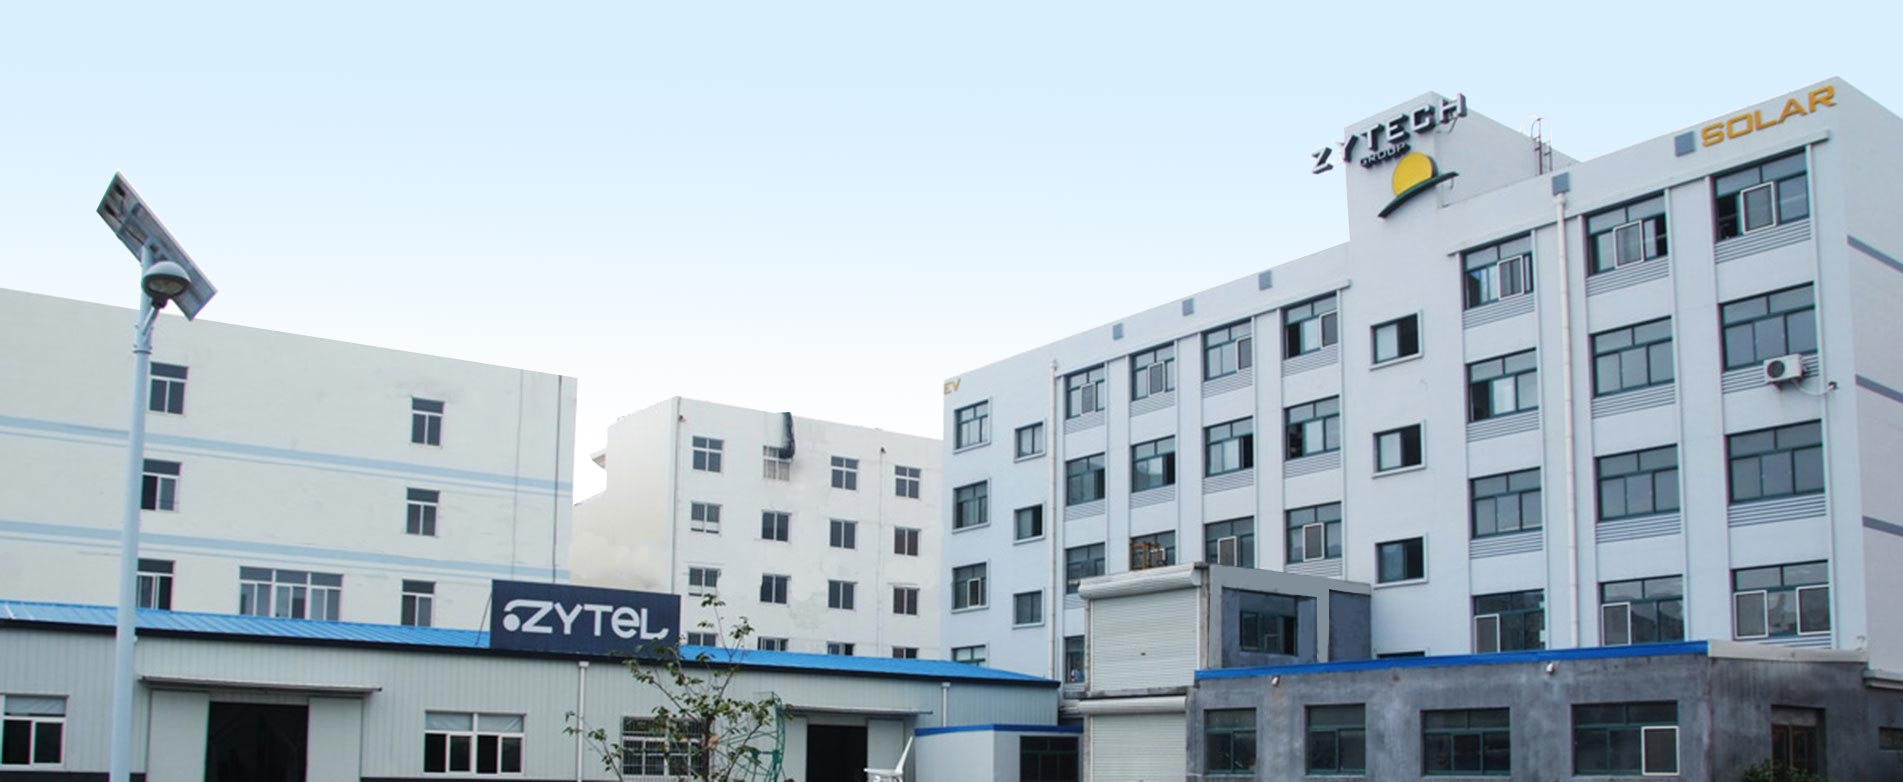 Fabrica en China de Zytech Solar y Zytel